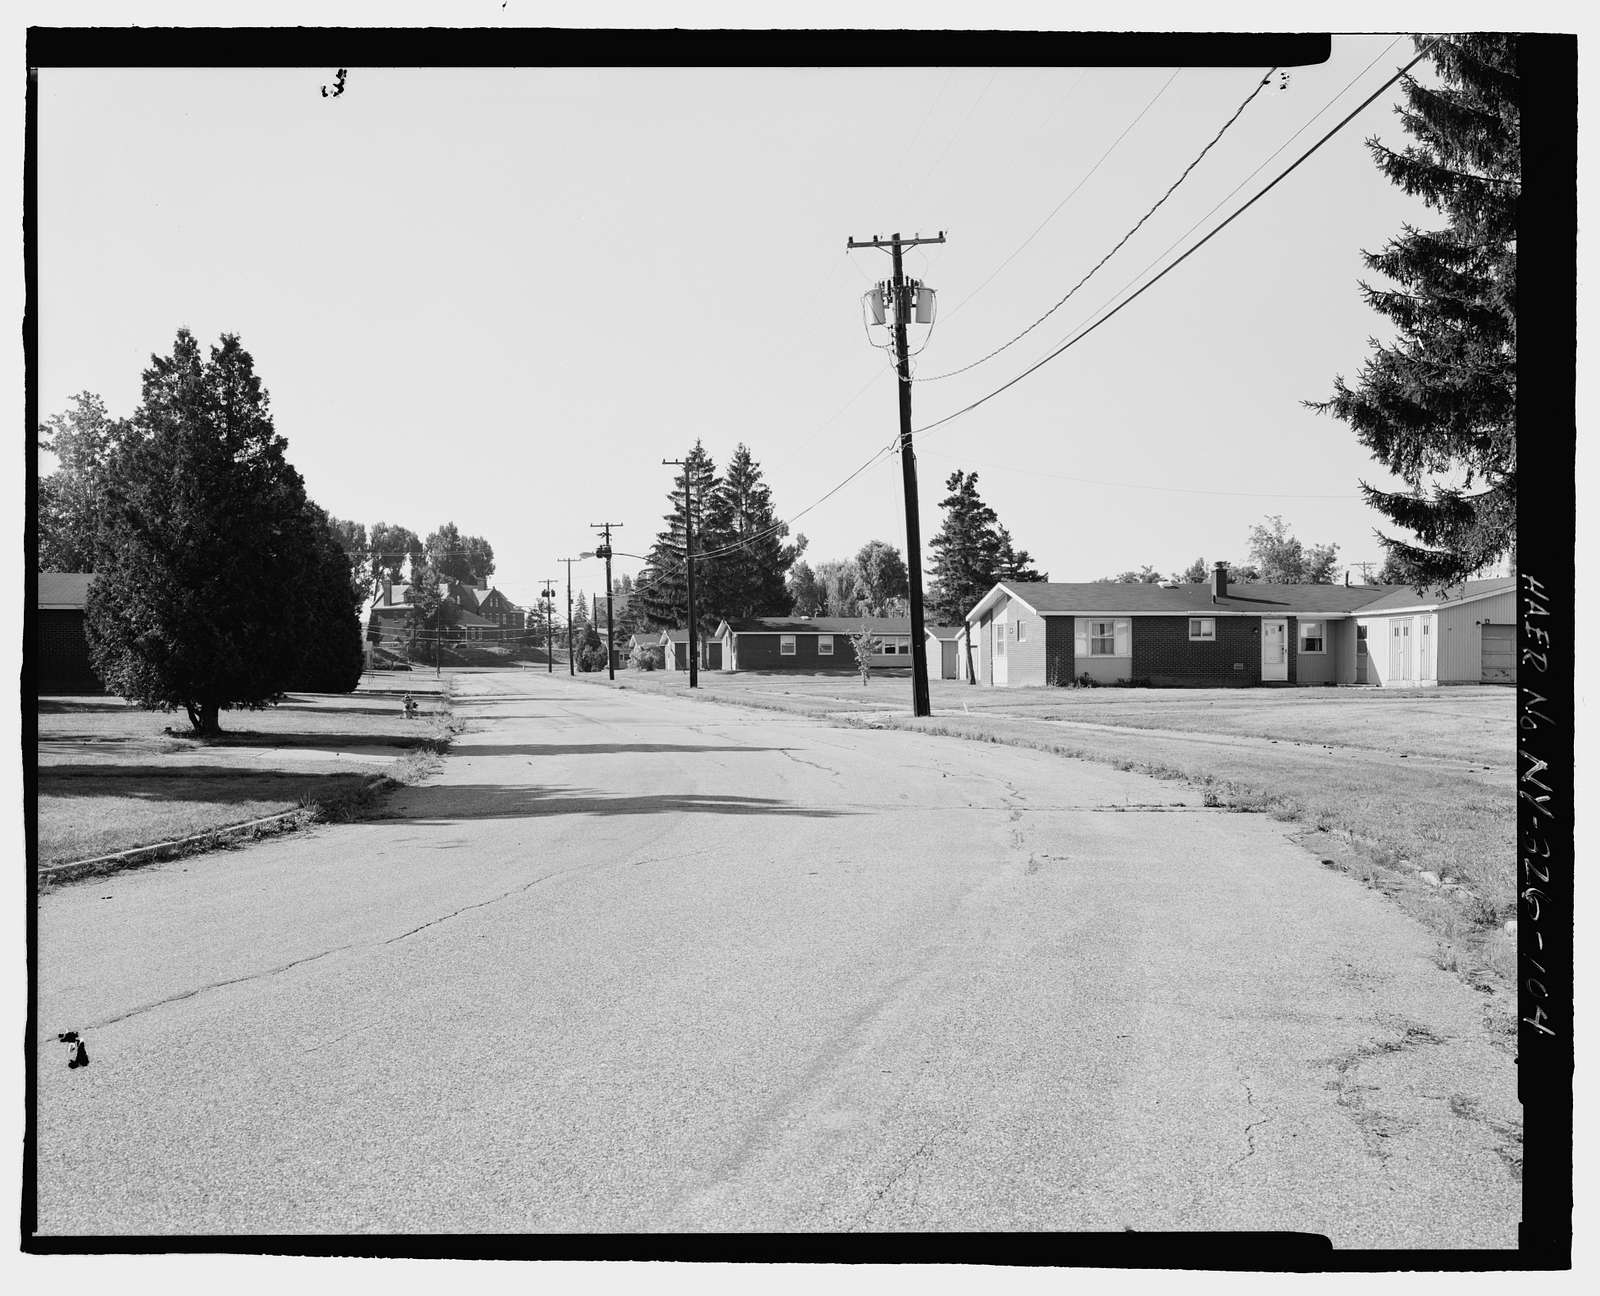 Plattsburgh Air Force Base, U.S. Route 9, Plattsburgh, Clinton County, NY